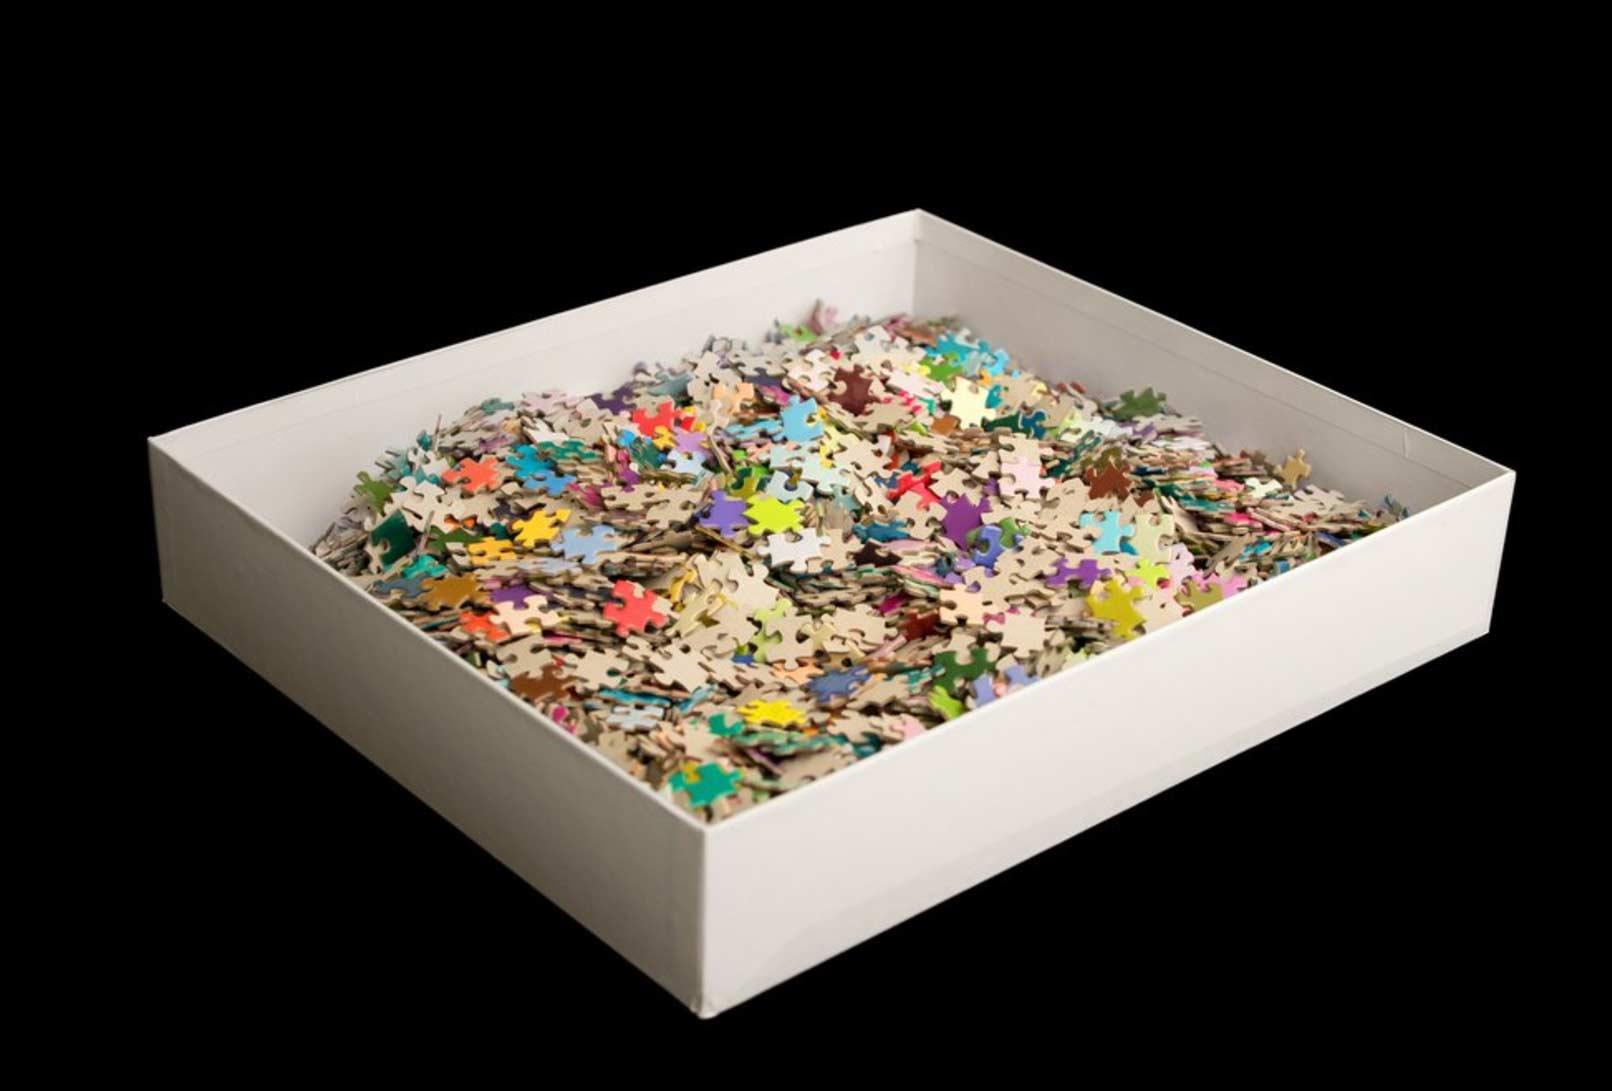 Farbverlauf-Puzzle mit 5.000 Teilen 5000-colors-puzzle_05